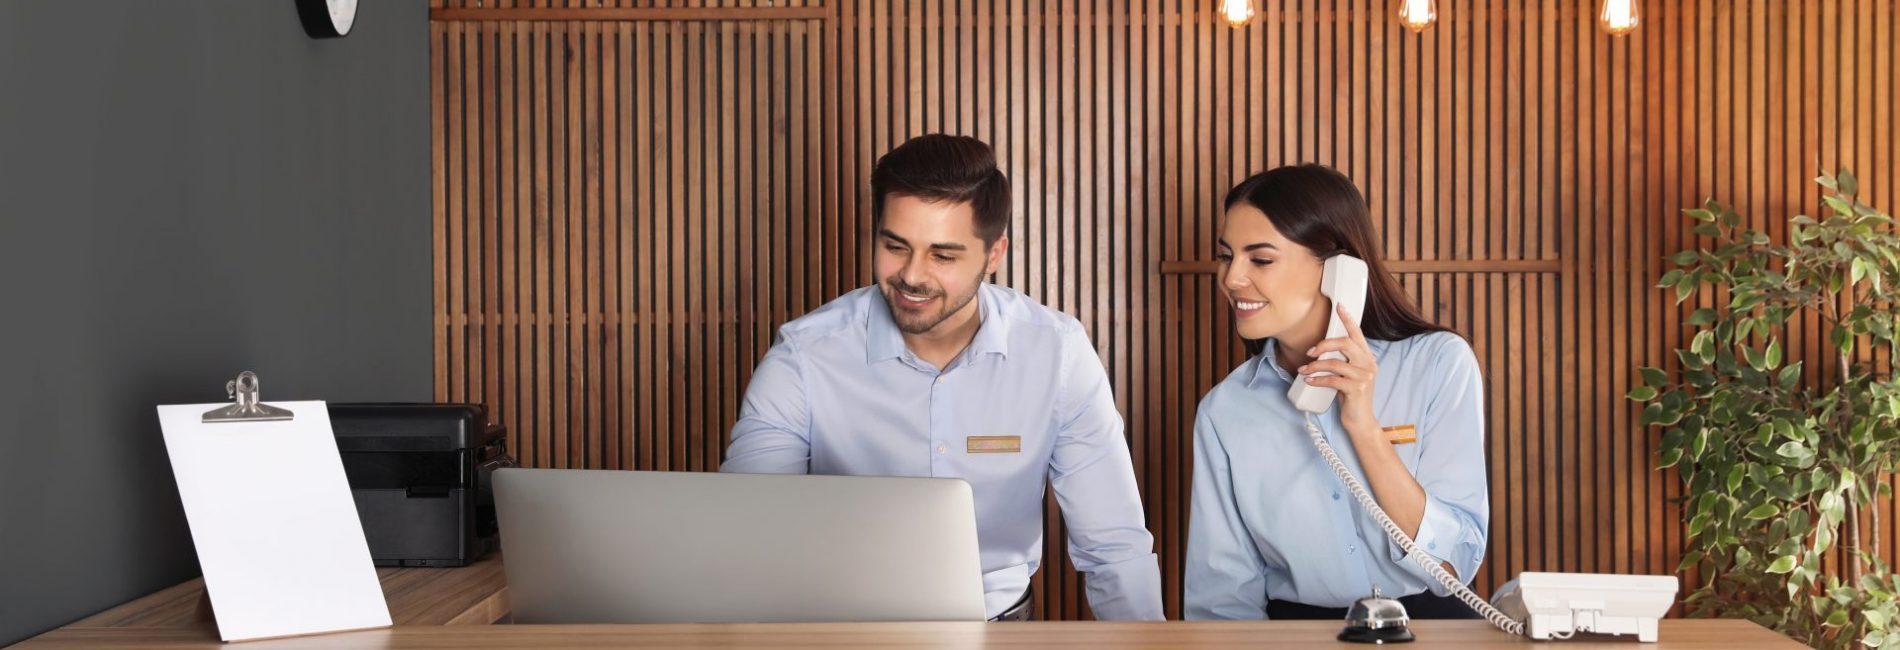 Developing Hotel Management Skills